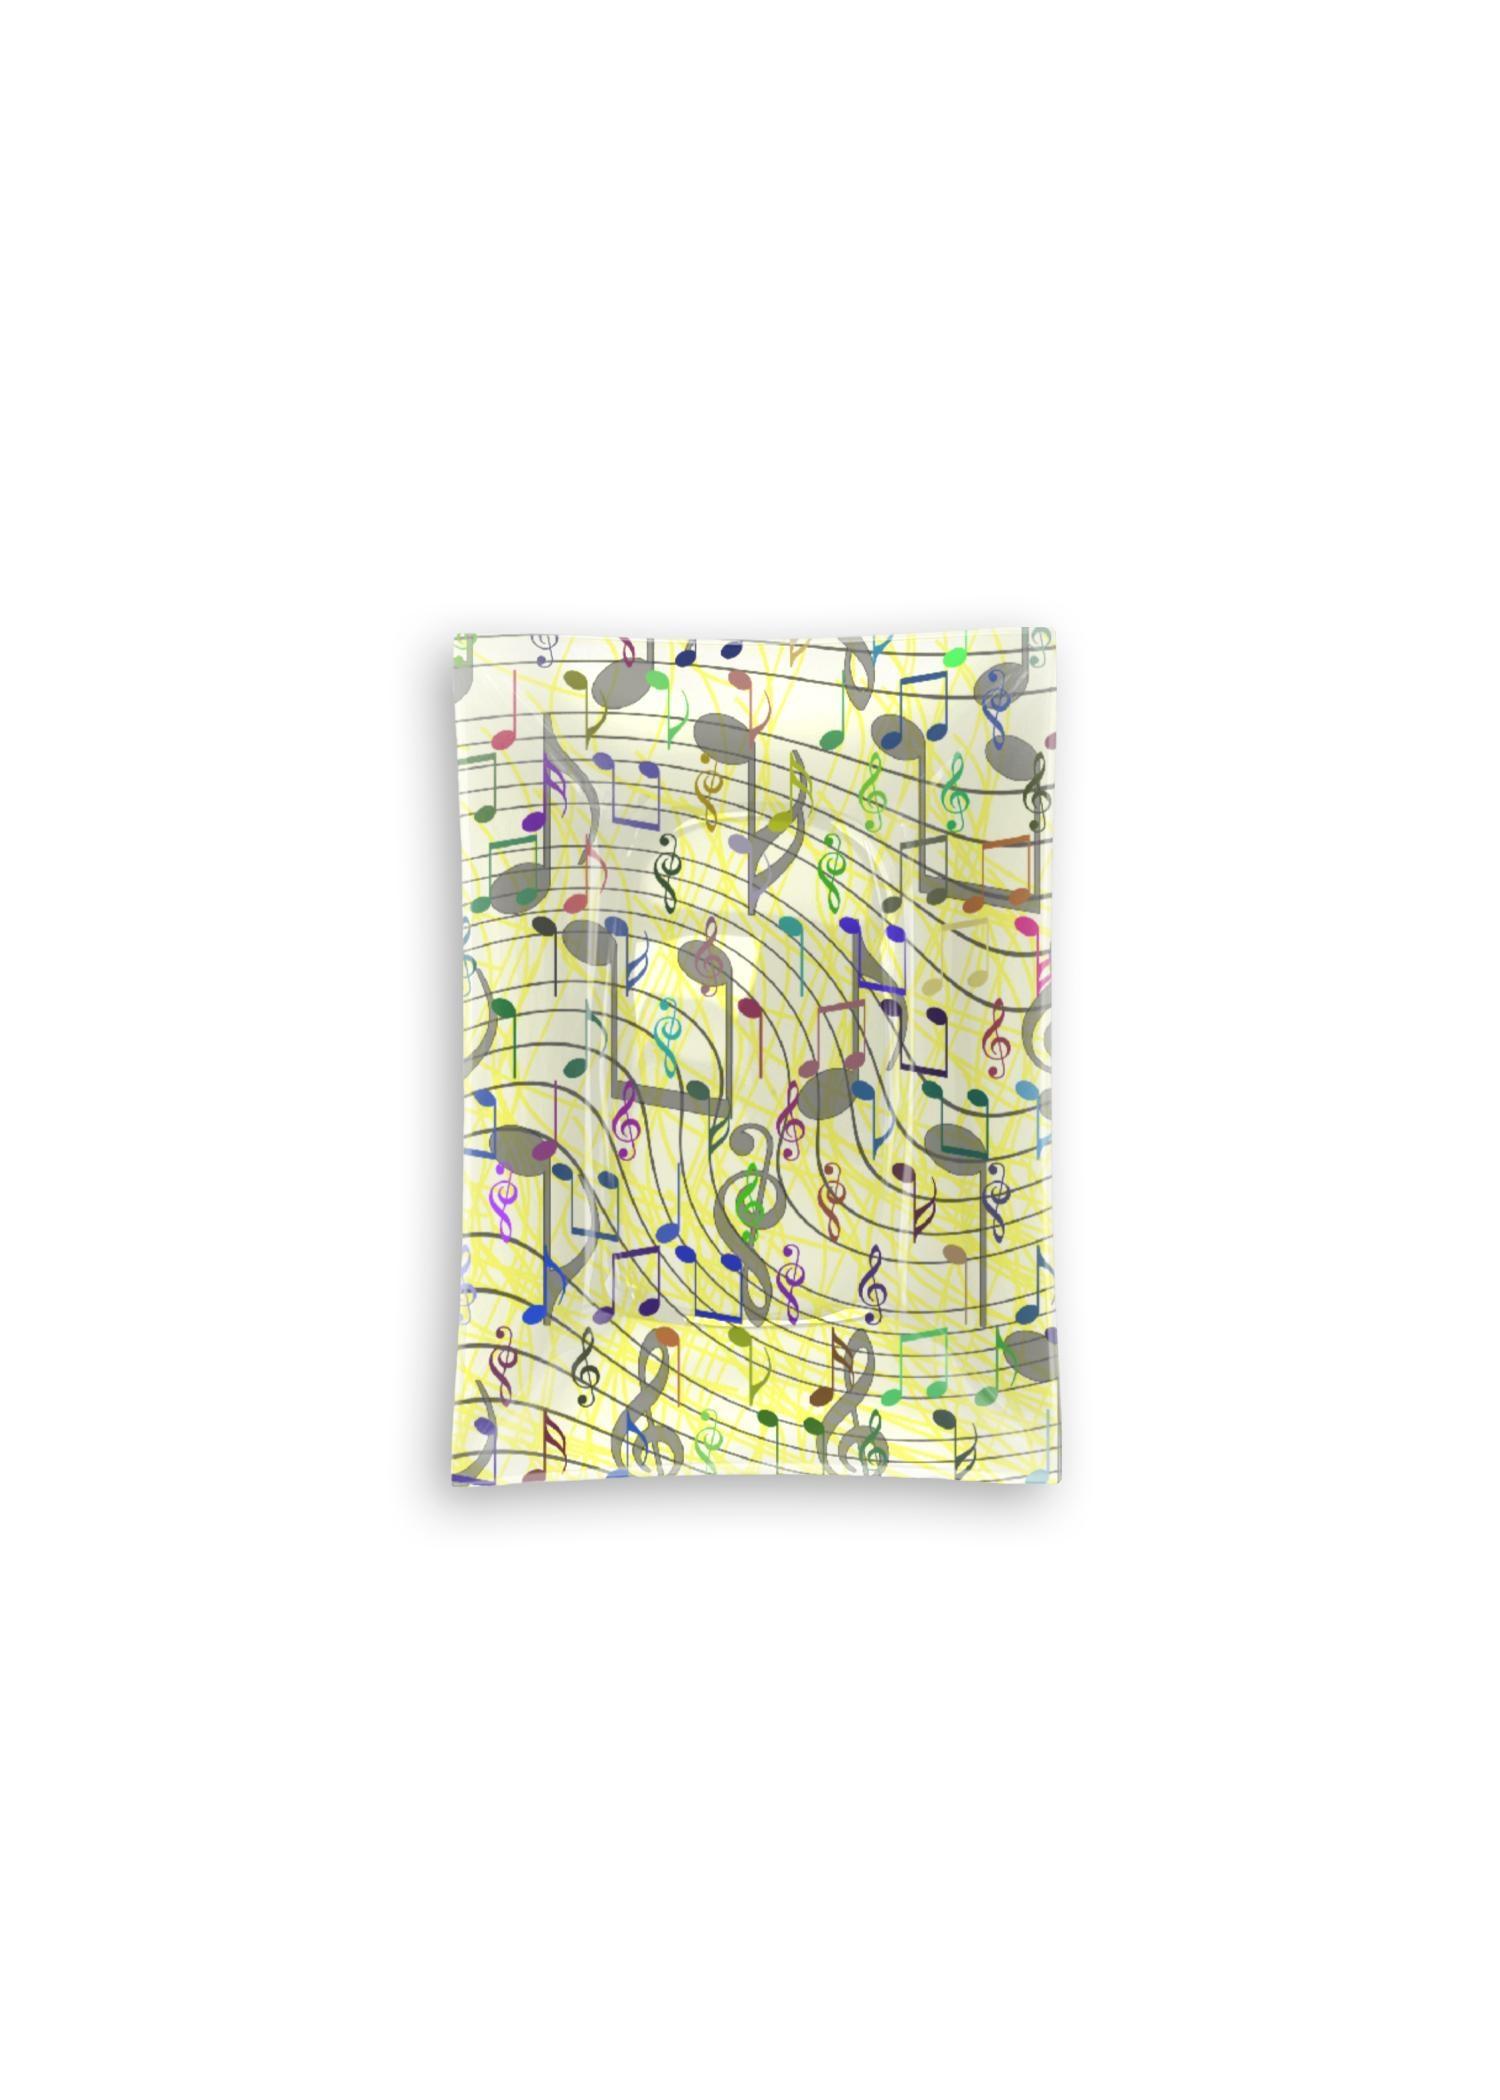 VIDA Oblong Glass Tray - Chaotic Music Notation by VIDA Original Artist  - Size: Small